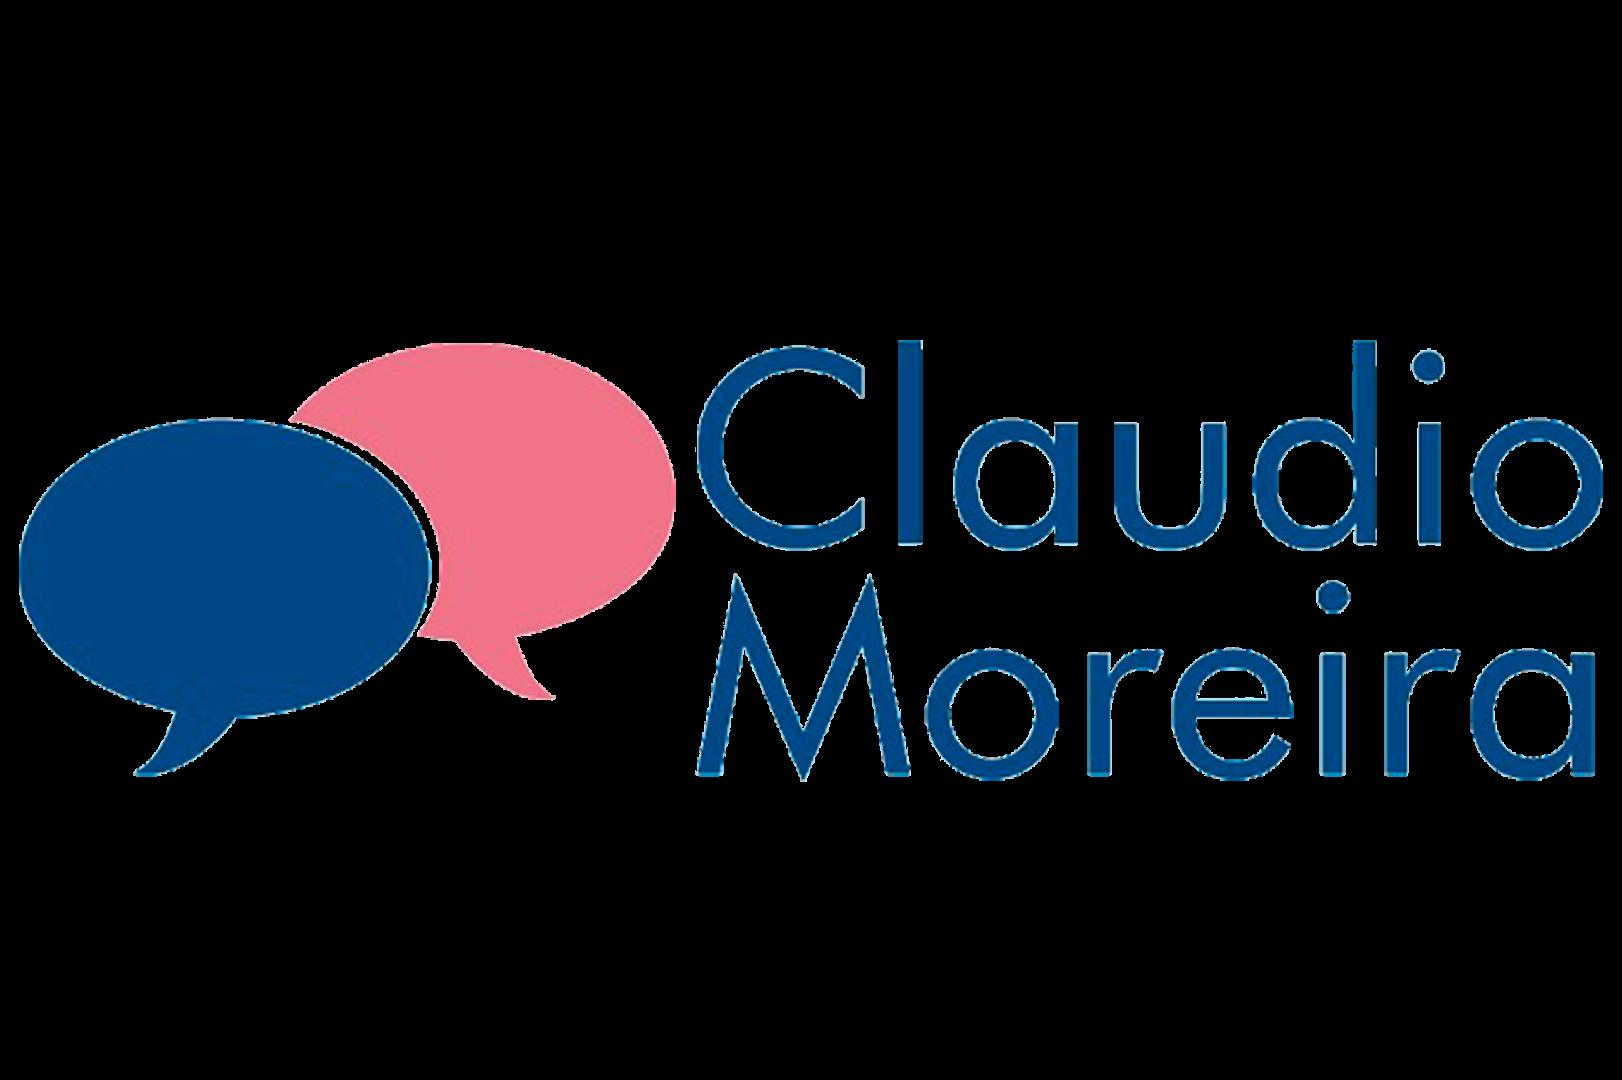 Claudio Moreira